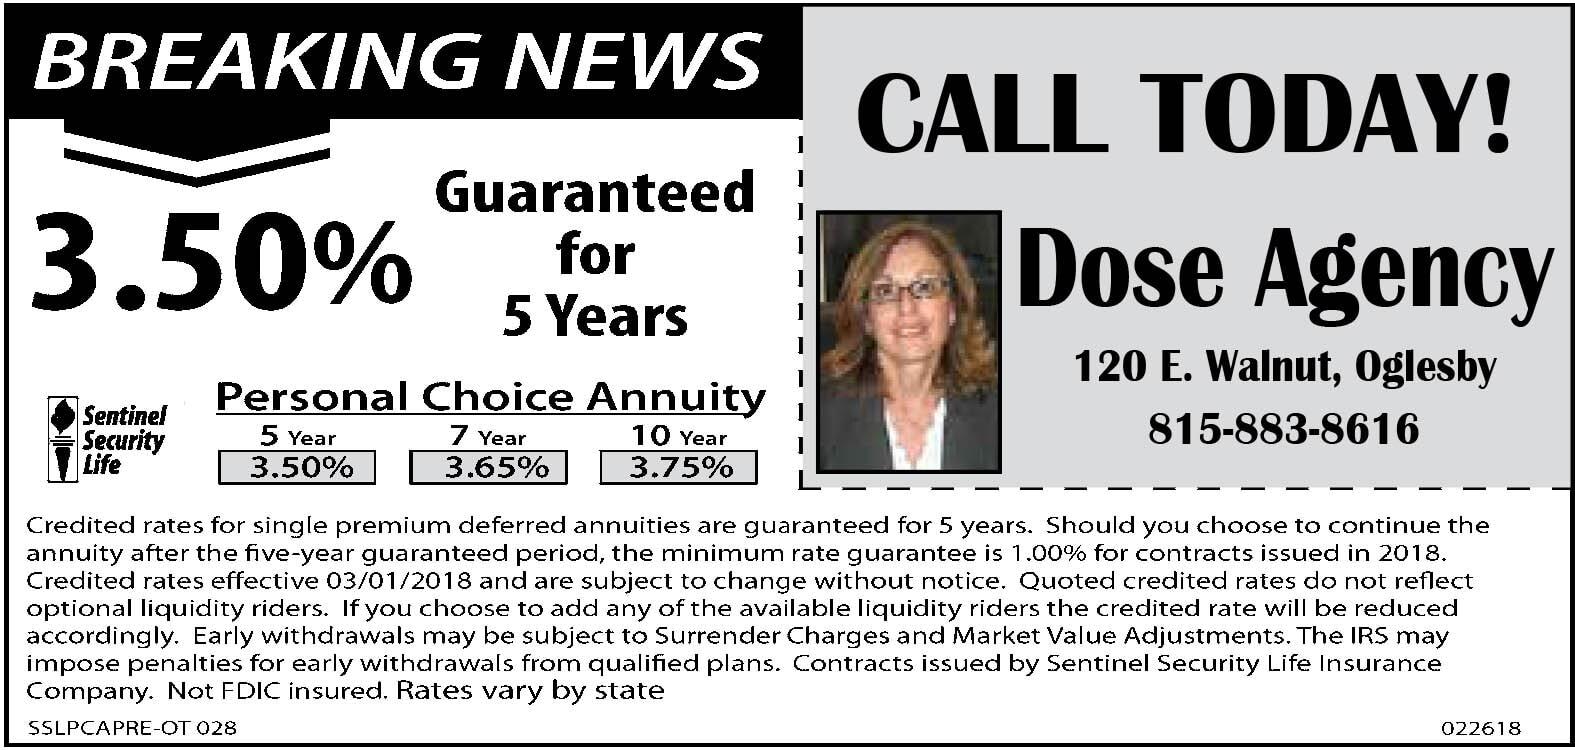 Dose Insurance Agency image 2